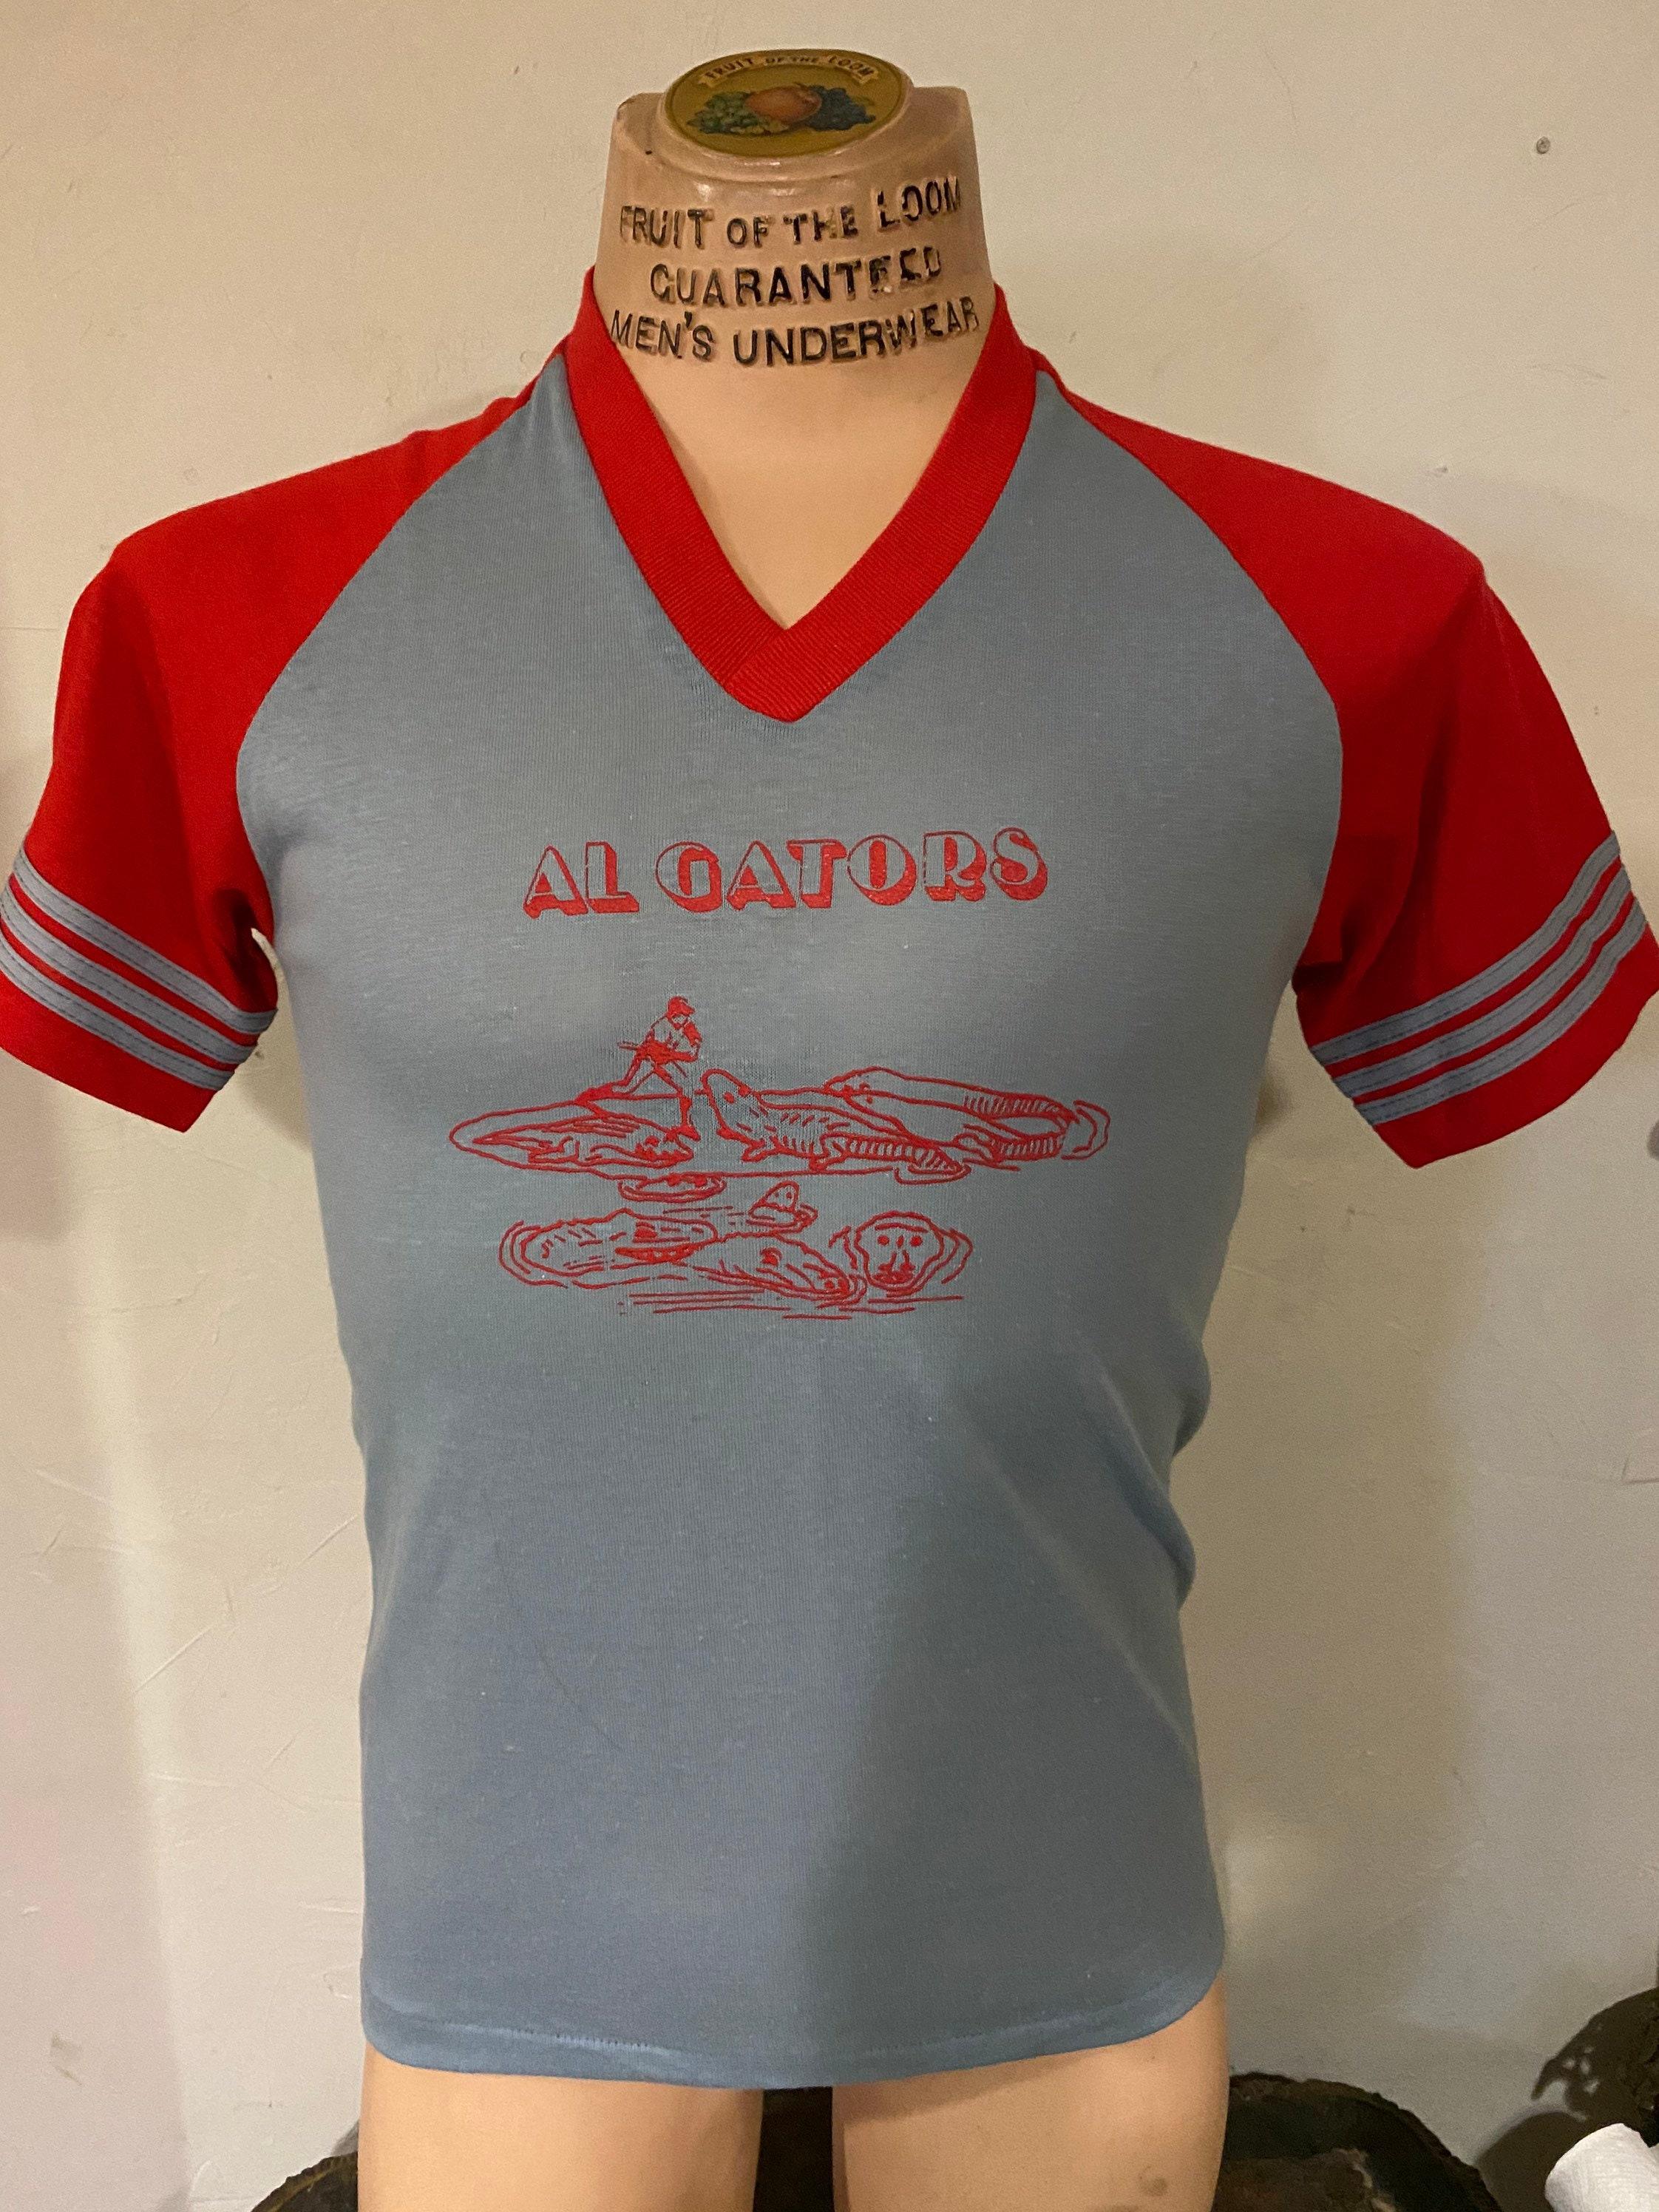 1970s Mens Shirt Styles – Vintage 70s Shirts for Guys 1970S Dodgers Sportswear Al Gators Aligators Baseball Jersey Shirt Vtg T-Shirt $0.00 AT vintagedancer.com